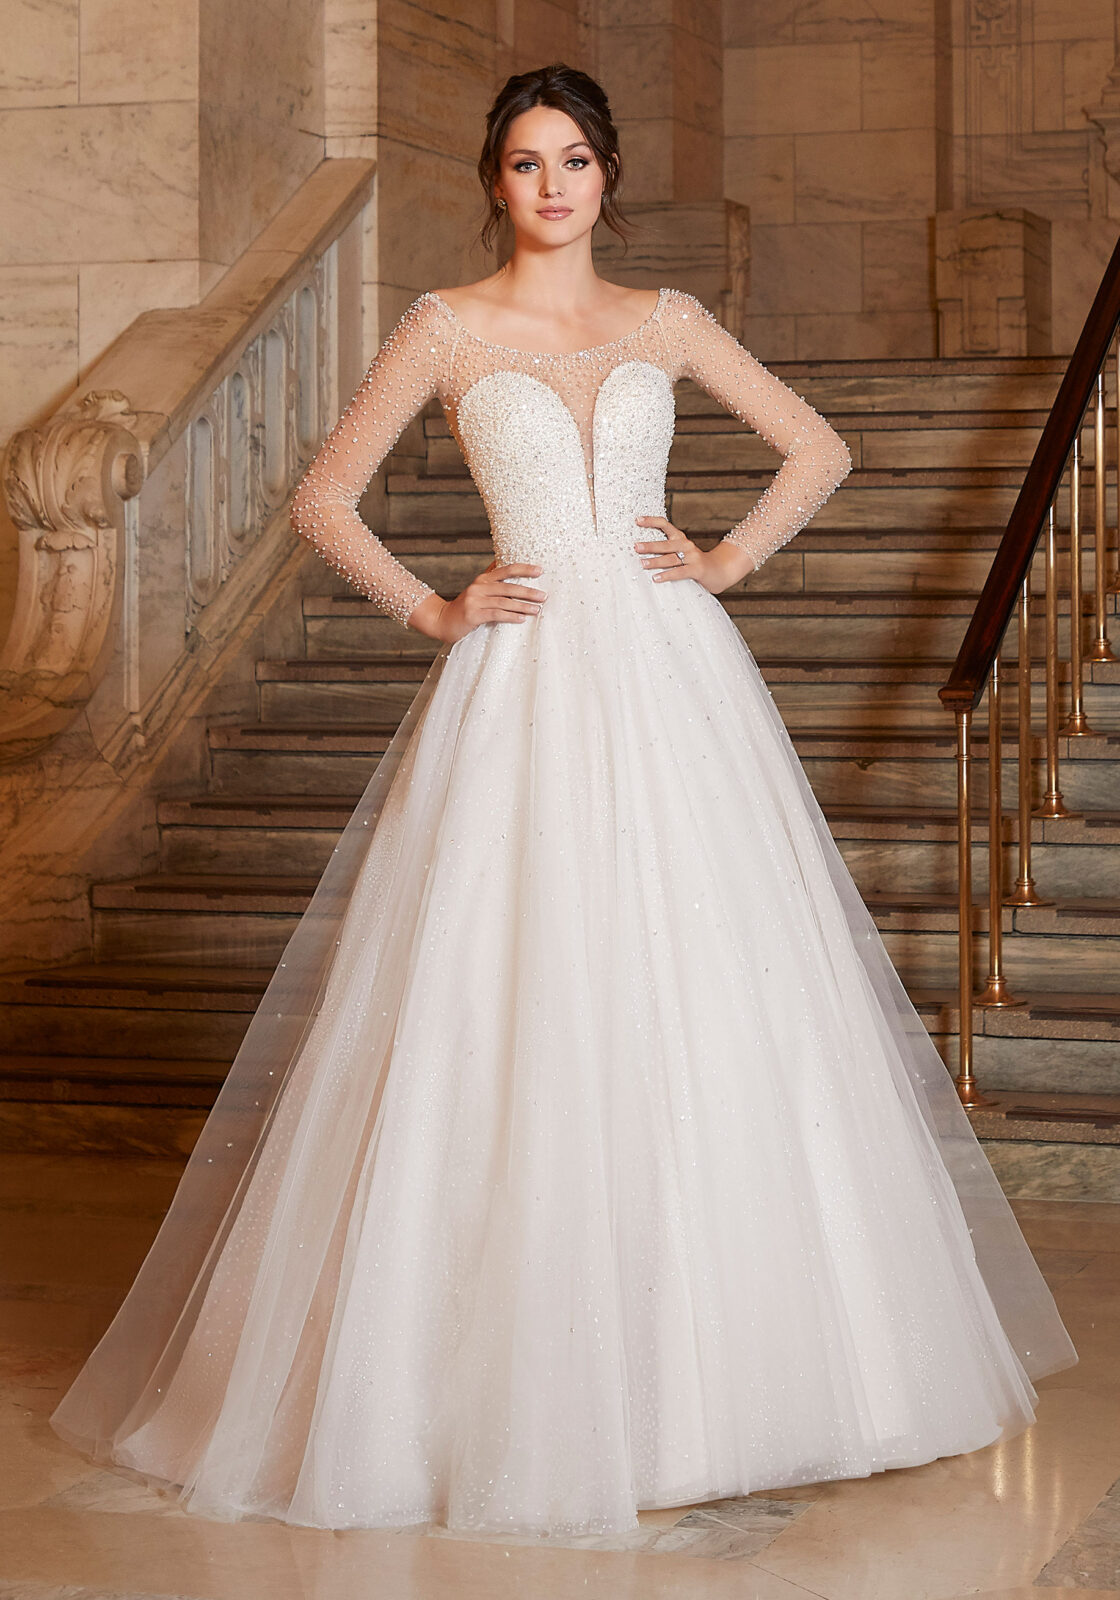 Designer: Morilee - Madiline Gardner Signature Collection - Angelina Wedding Dress - 1049